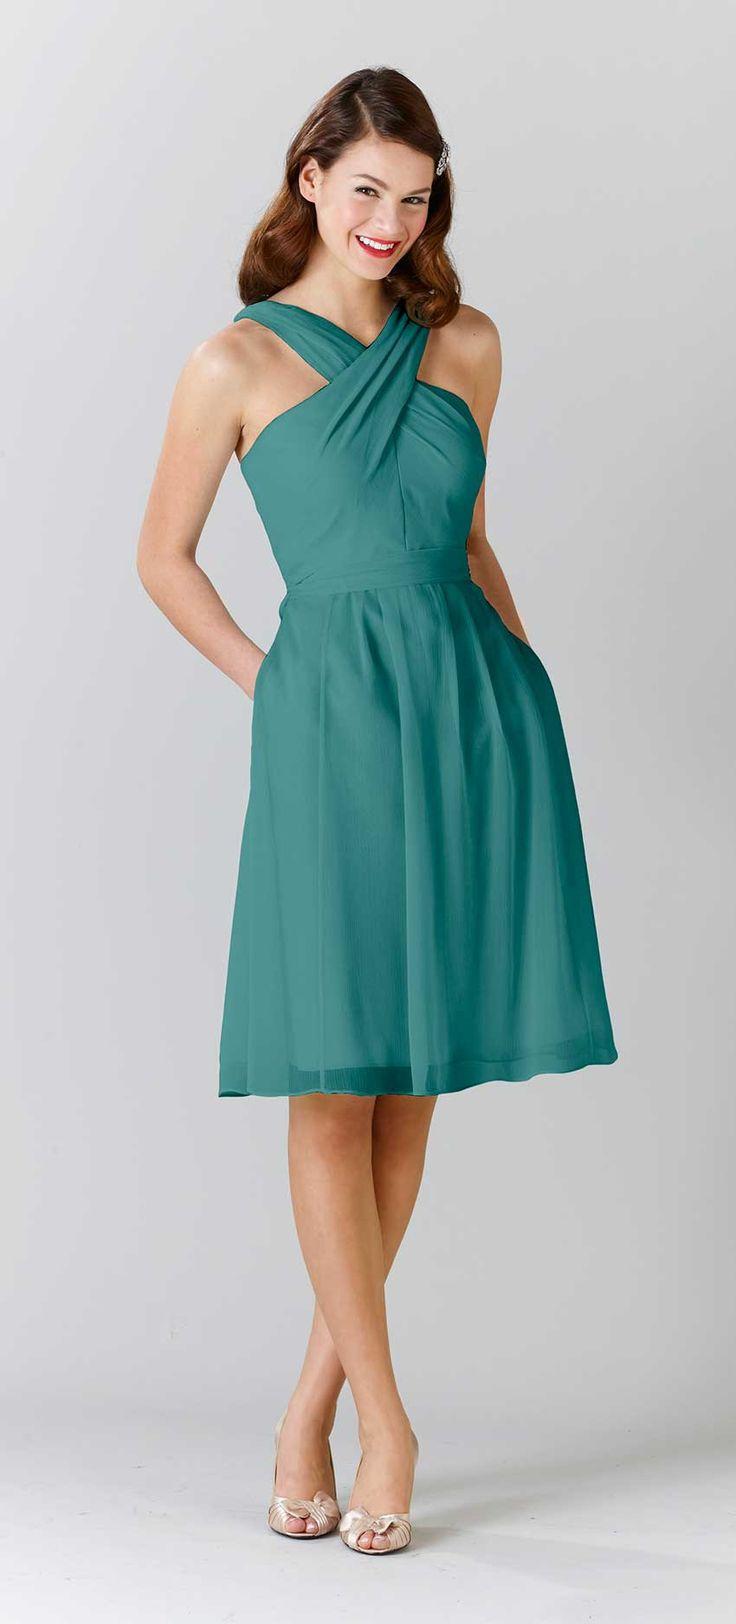 Mint green strapless bridesmaid dresses naf dresses - A Unique Neckline For A Gorgeous Teal Bridesmaid Dress Kennedy Blue Bridesmaid Dress Audrey